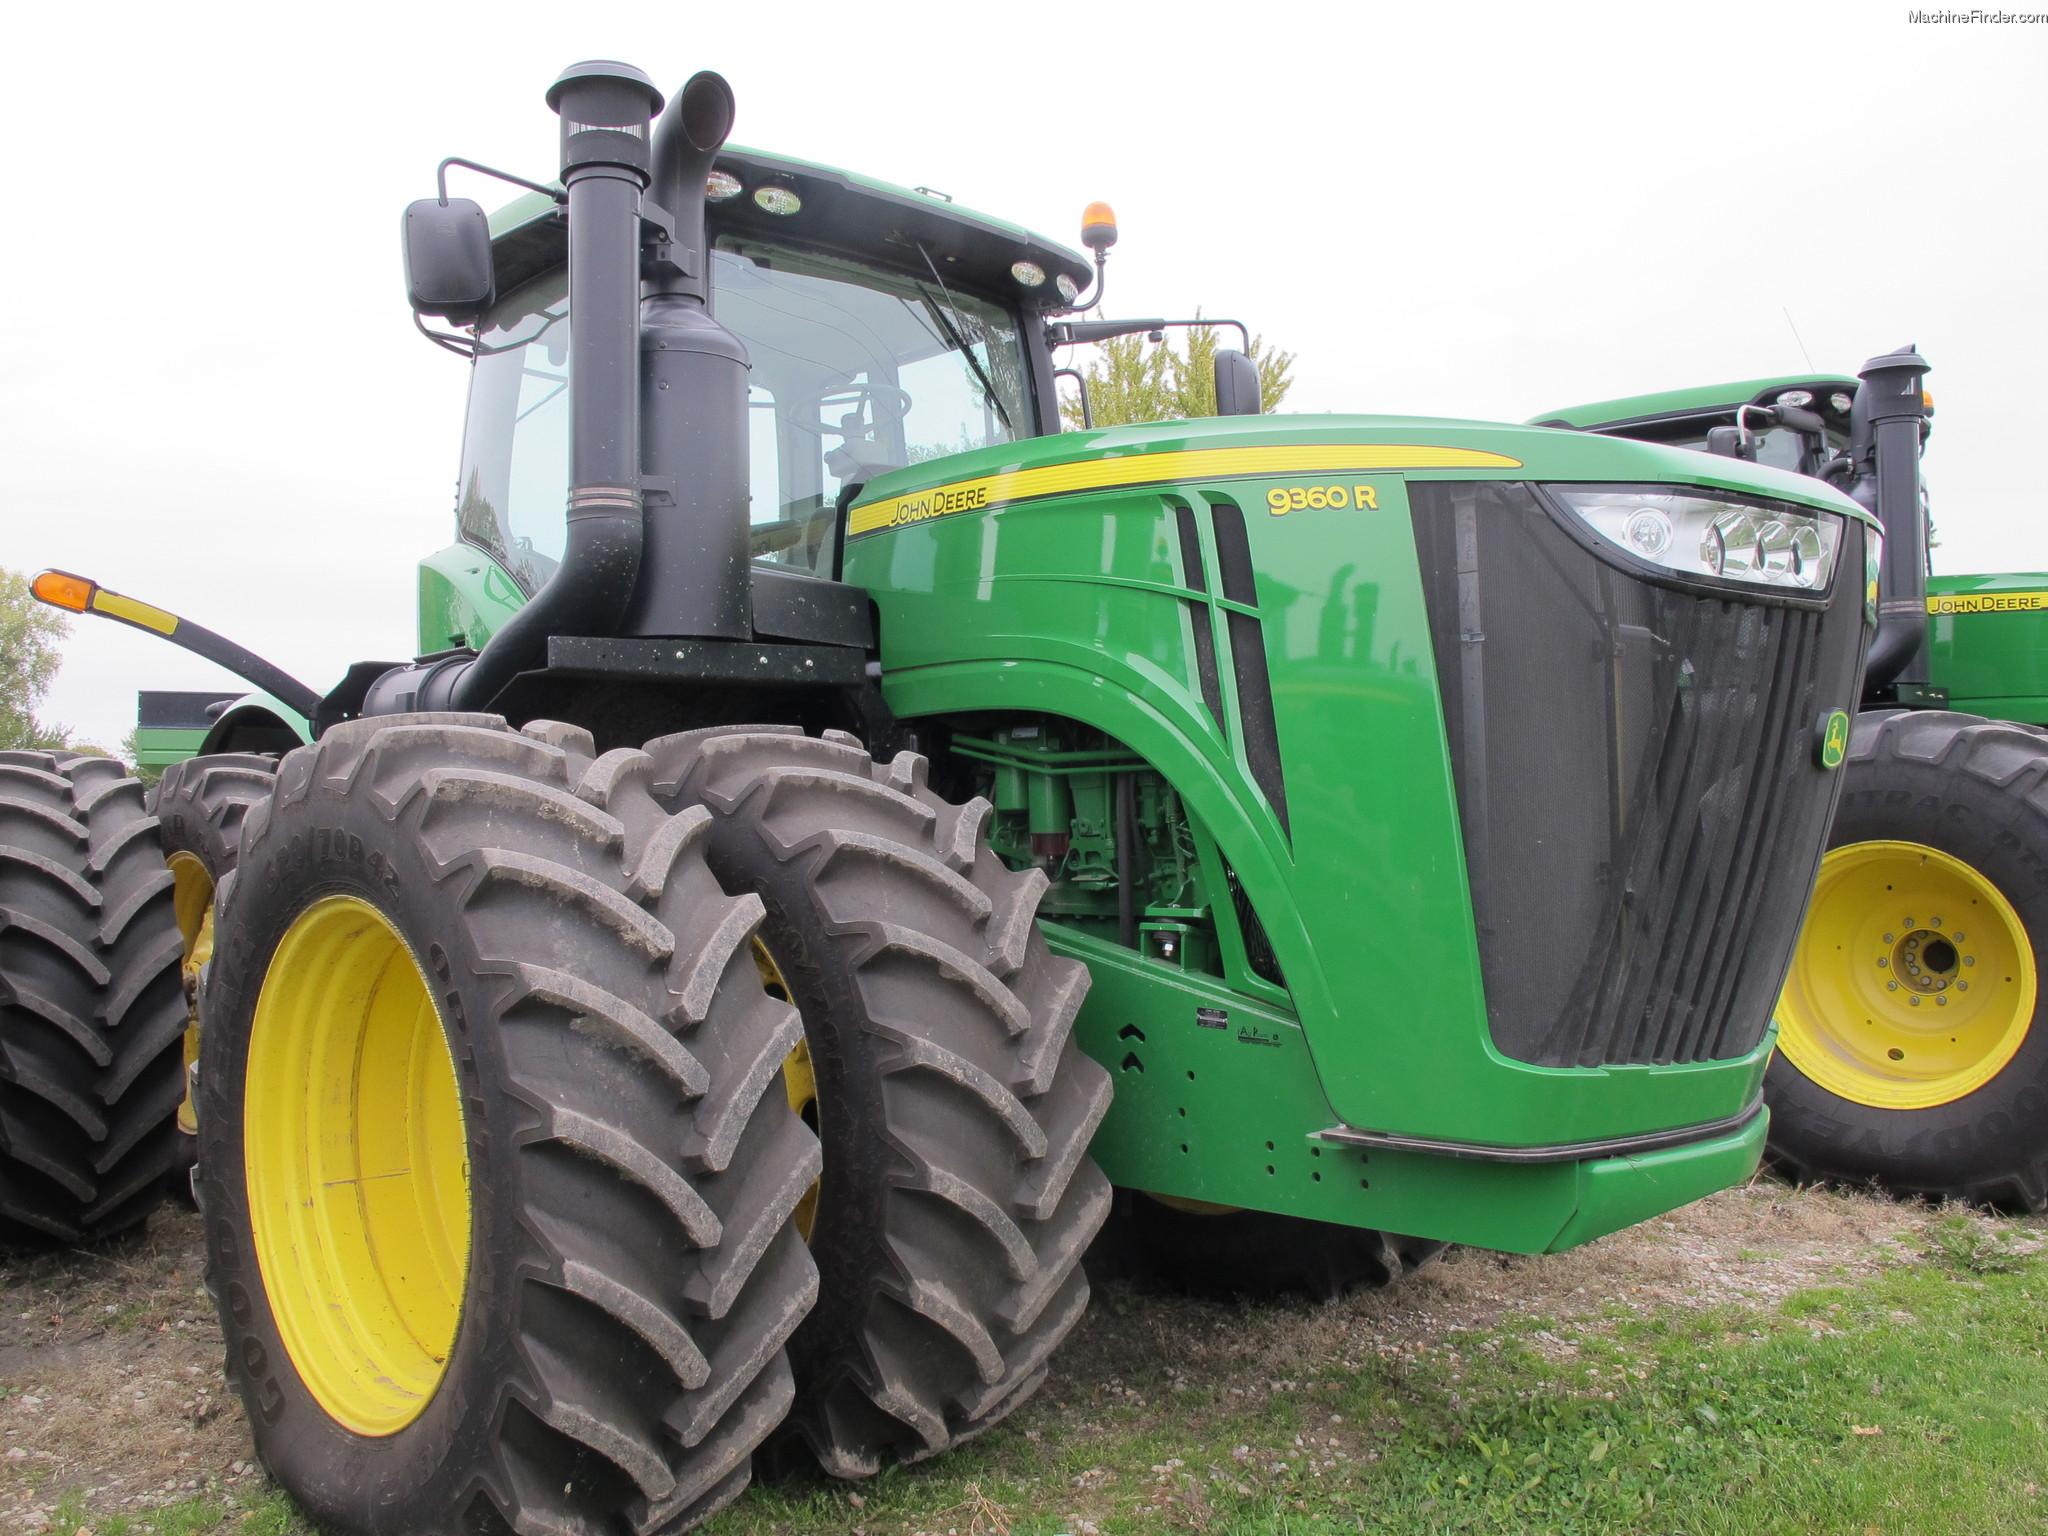 2013 John Deere 9360R Tractors - Articulated 4WD - John ...